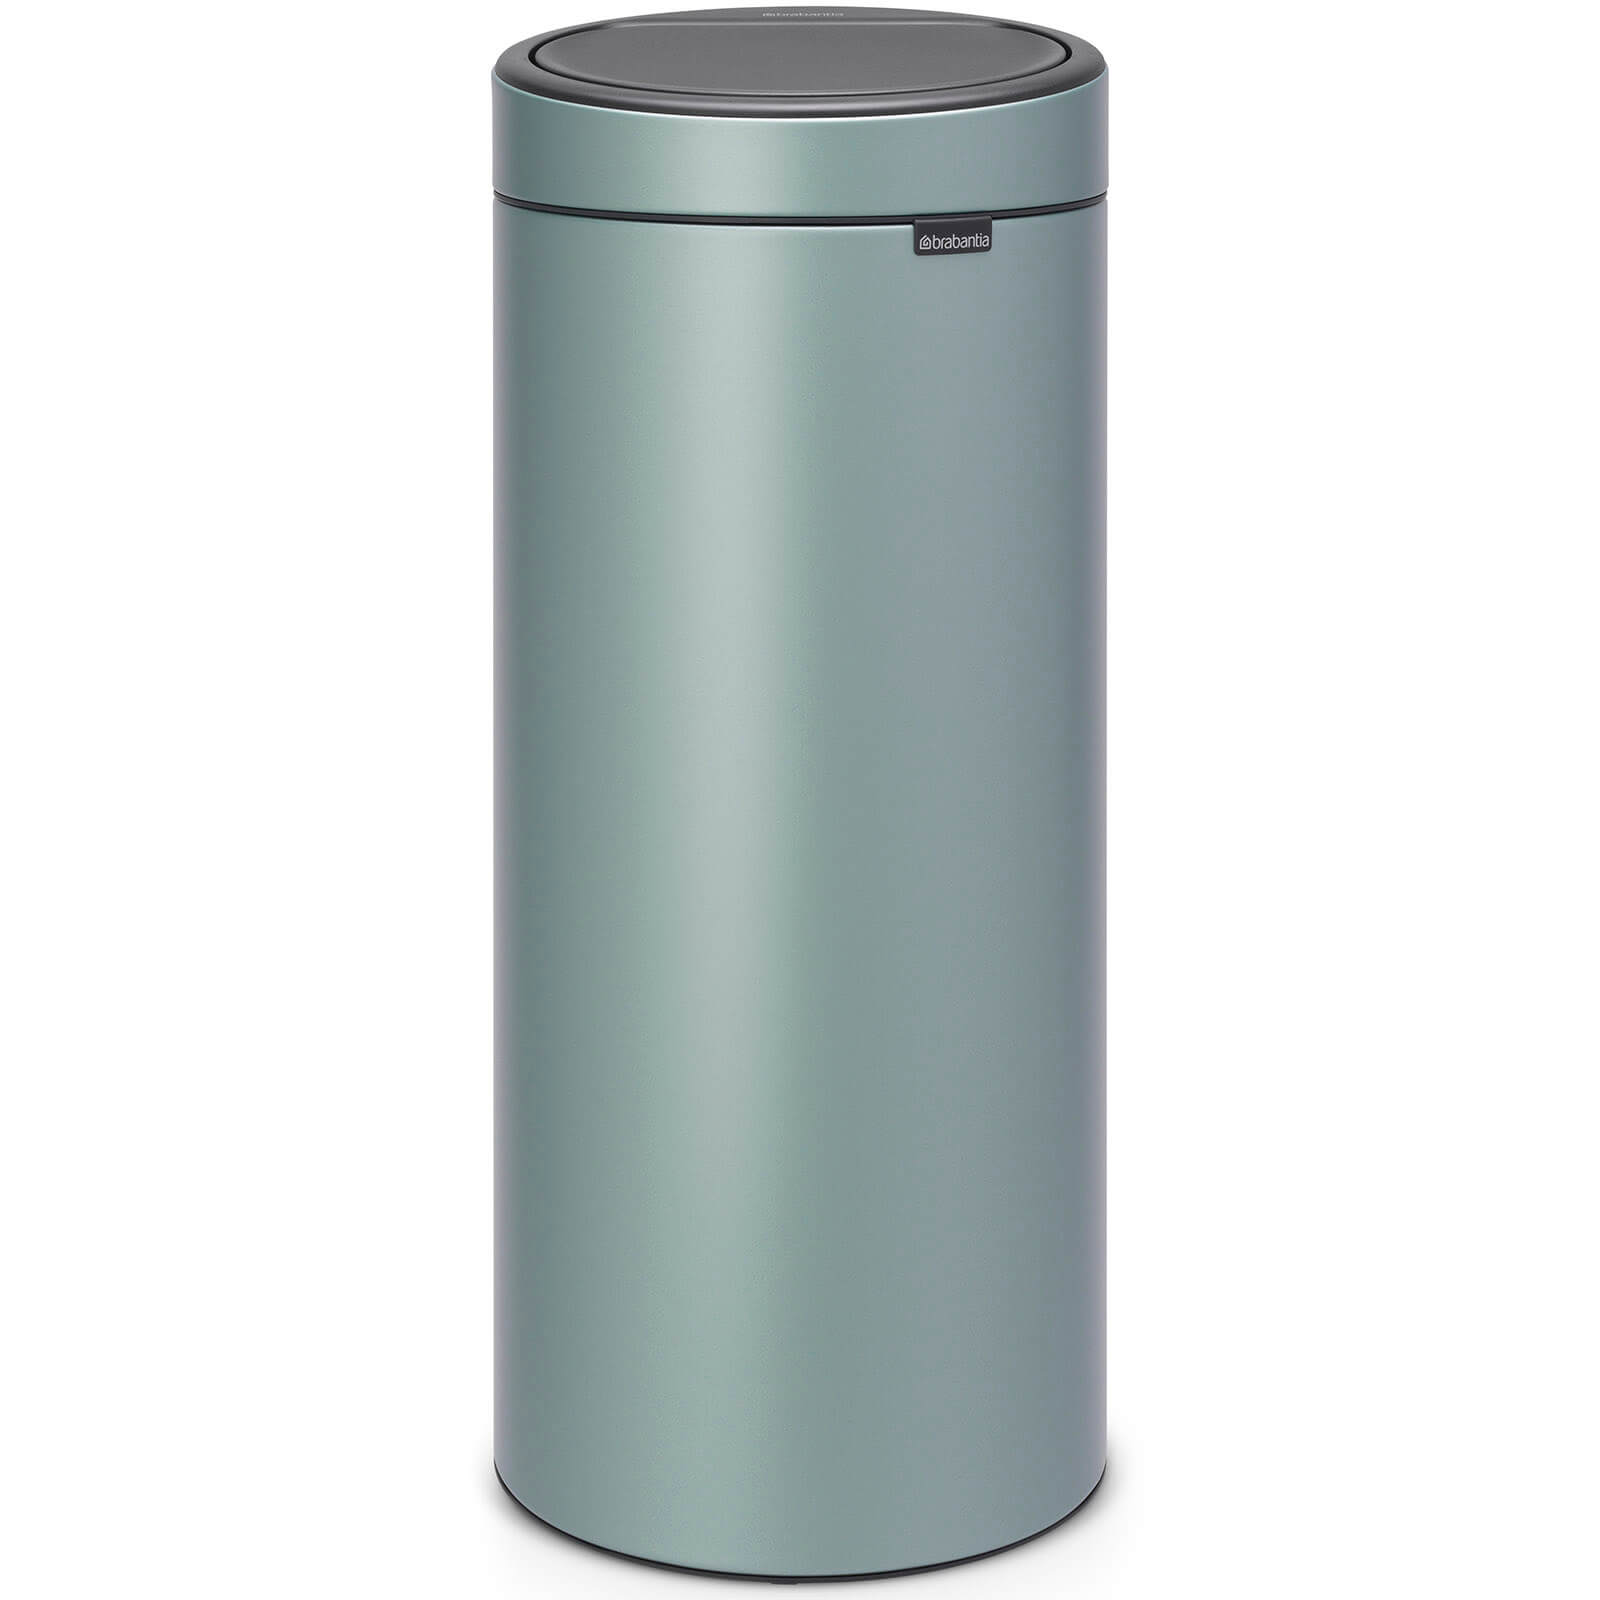 Brabantia Touch Bin 50 Liter Wit.Brabantia 30 Litre Touch Bin Metallic Mint